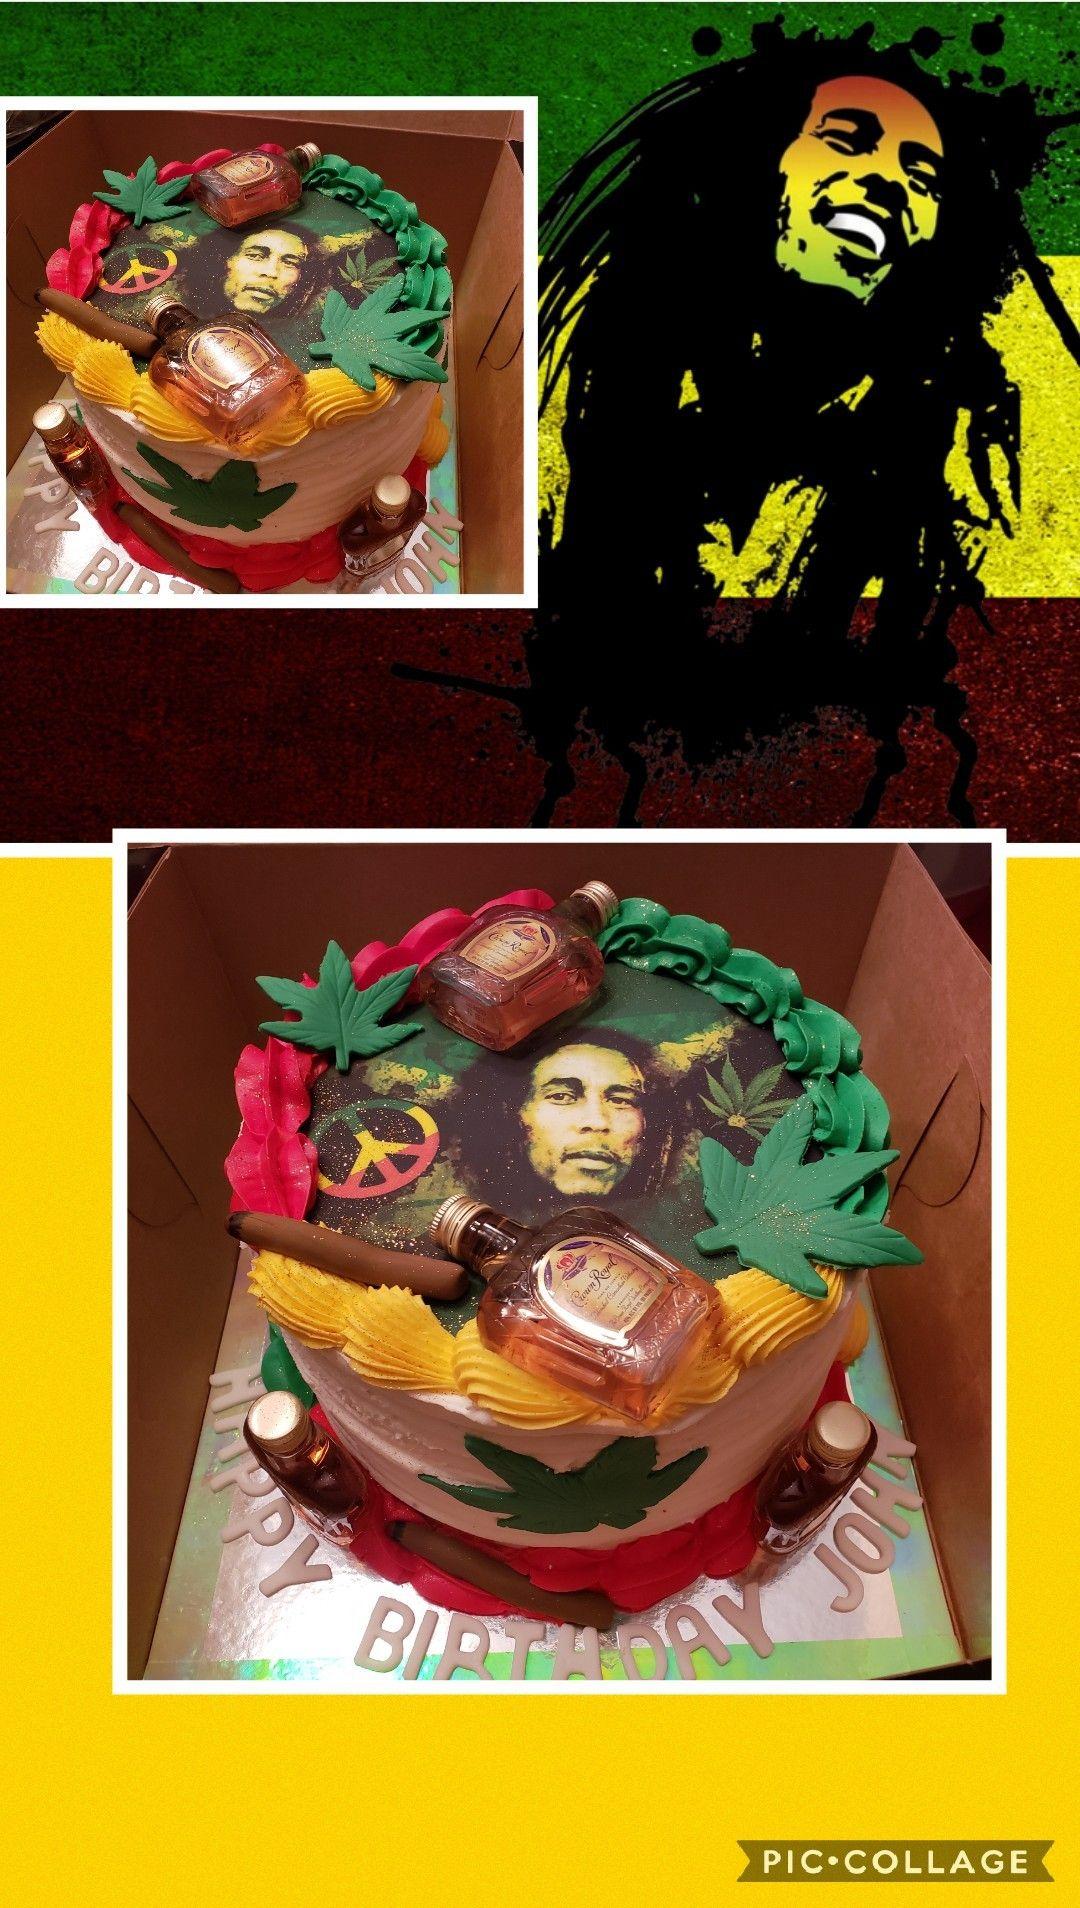 Sensational Bob Marley Theme Birthday Cake Customized For The Birthday Person Funny Birthday Cards Online Elaedamsfinfo